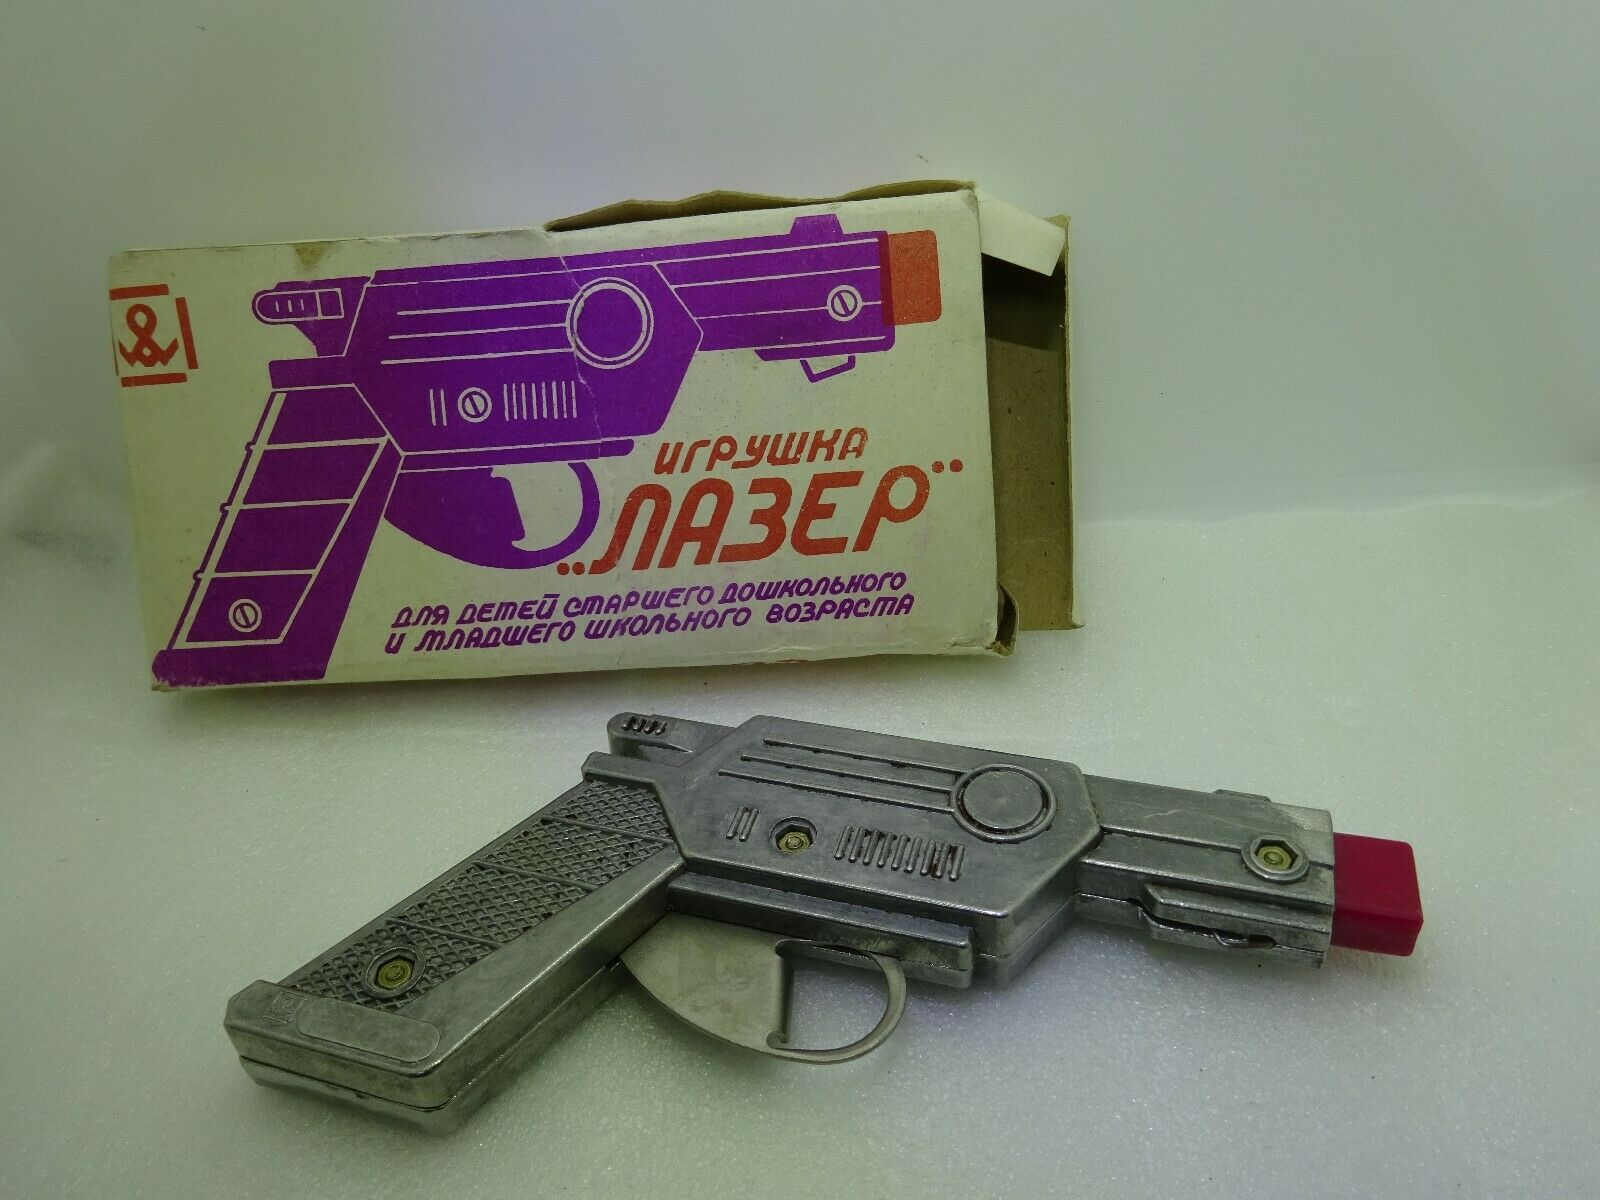 Vintage pistola Pistola de Juguete de Rusia Soviética URSS en Caja Original